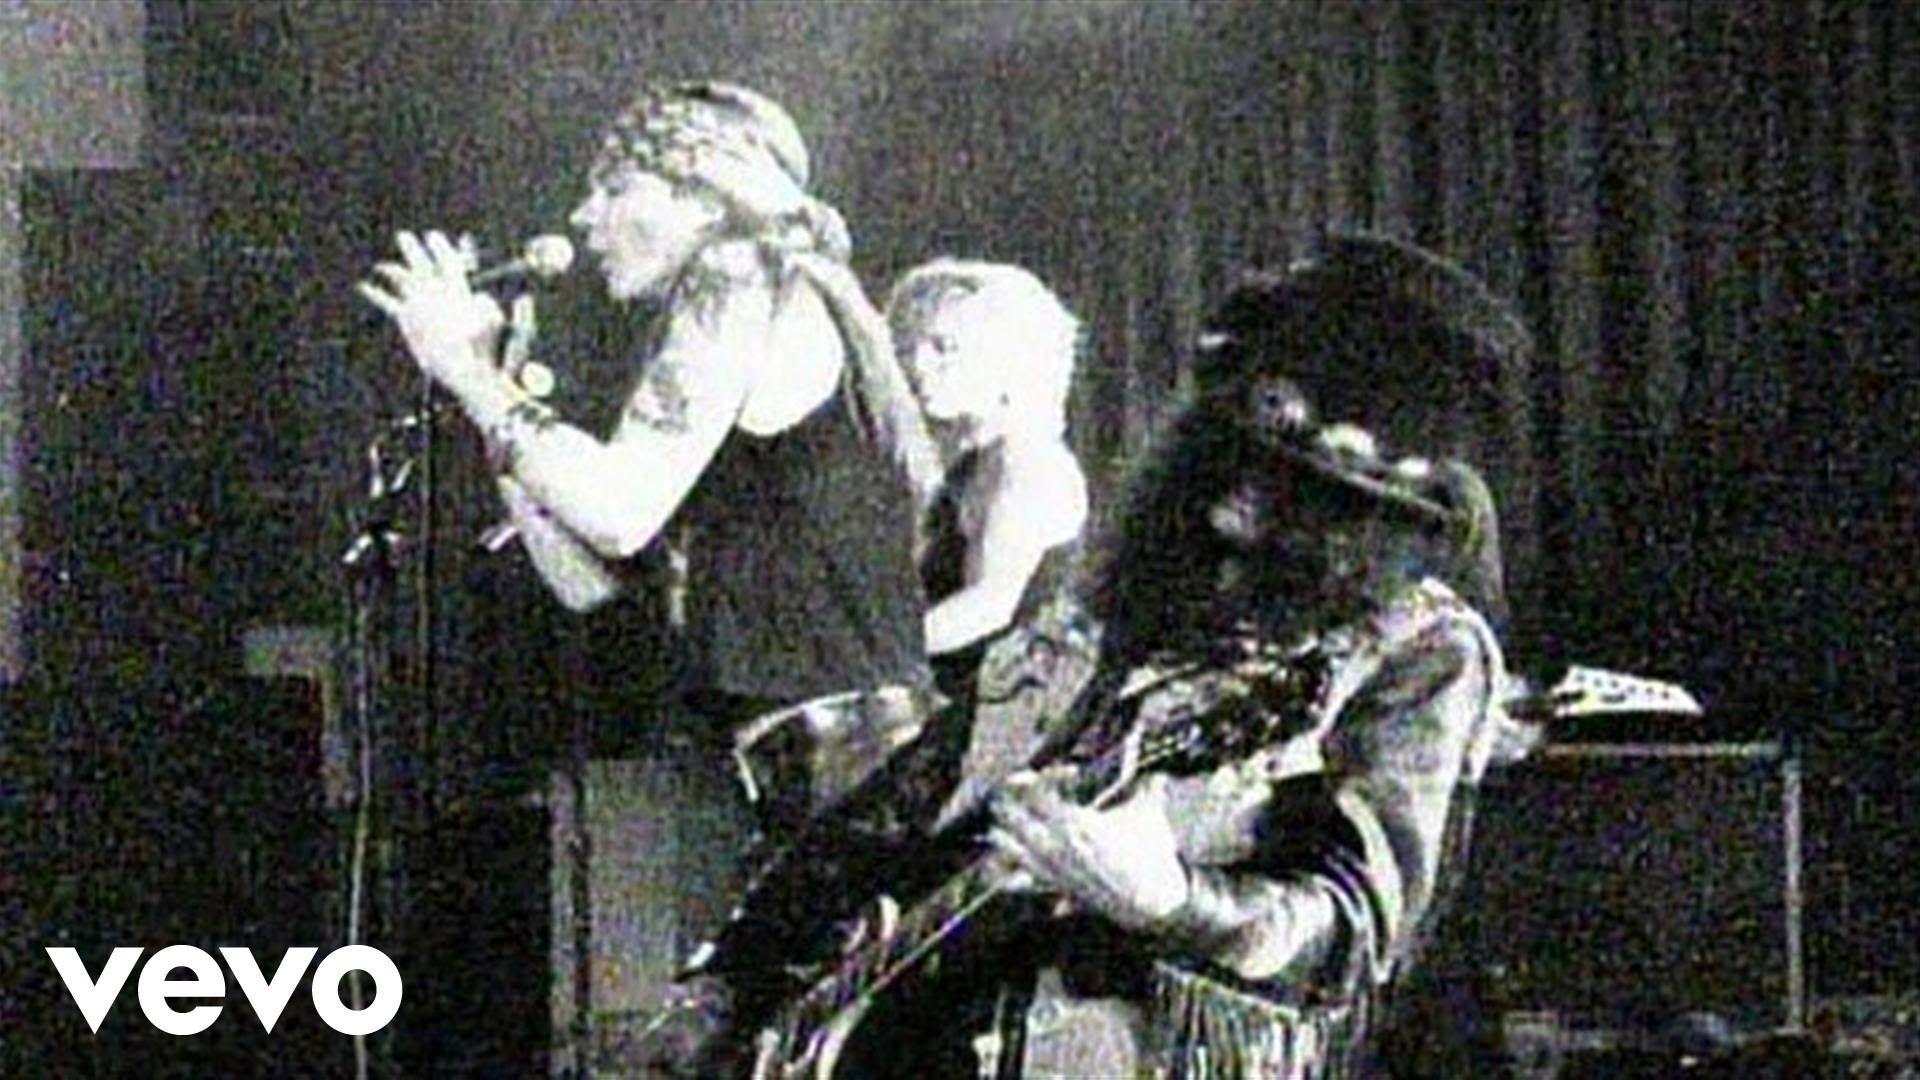 Guns N' Roses - Sweet Child O' Mine - YouTube Music